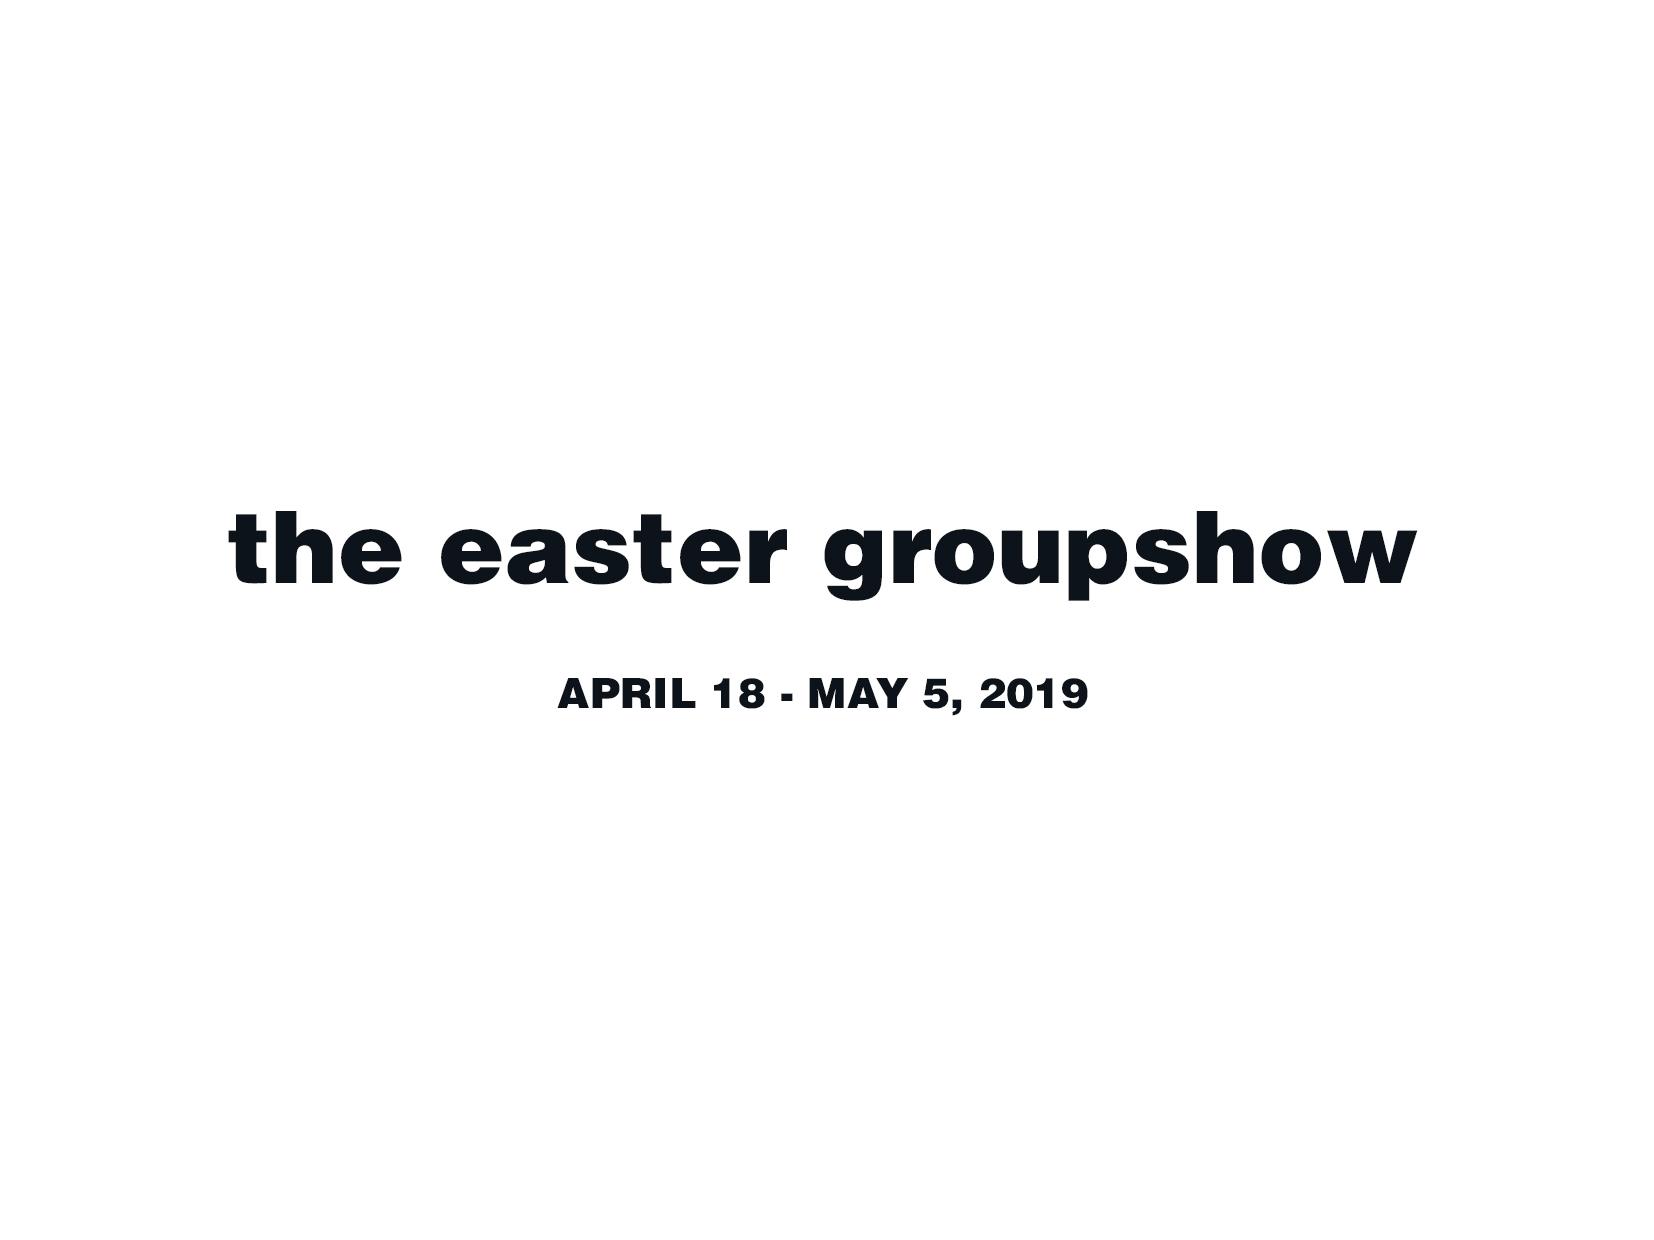 thespringgroupshow copy (2)